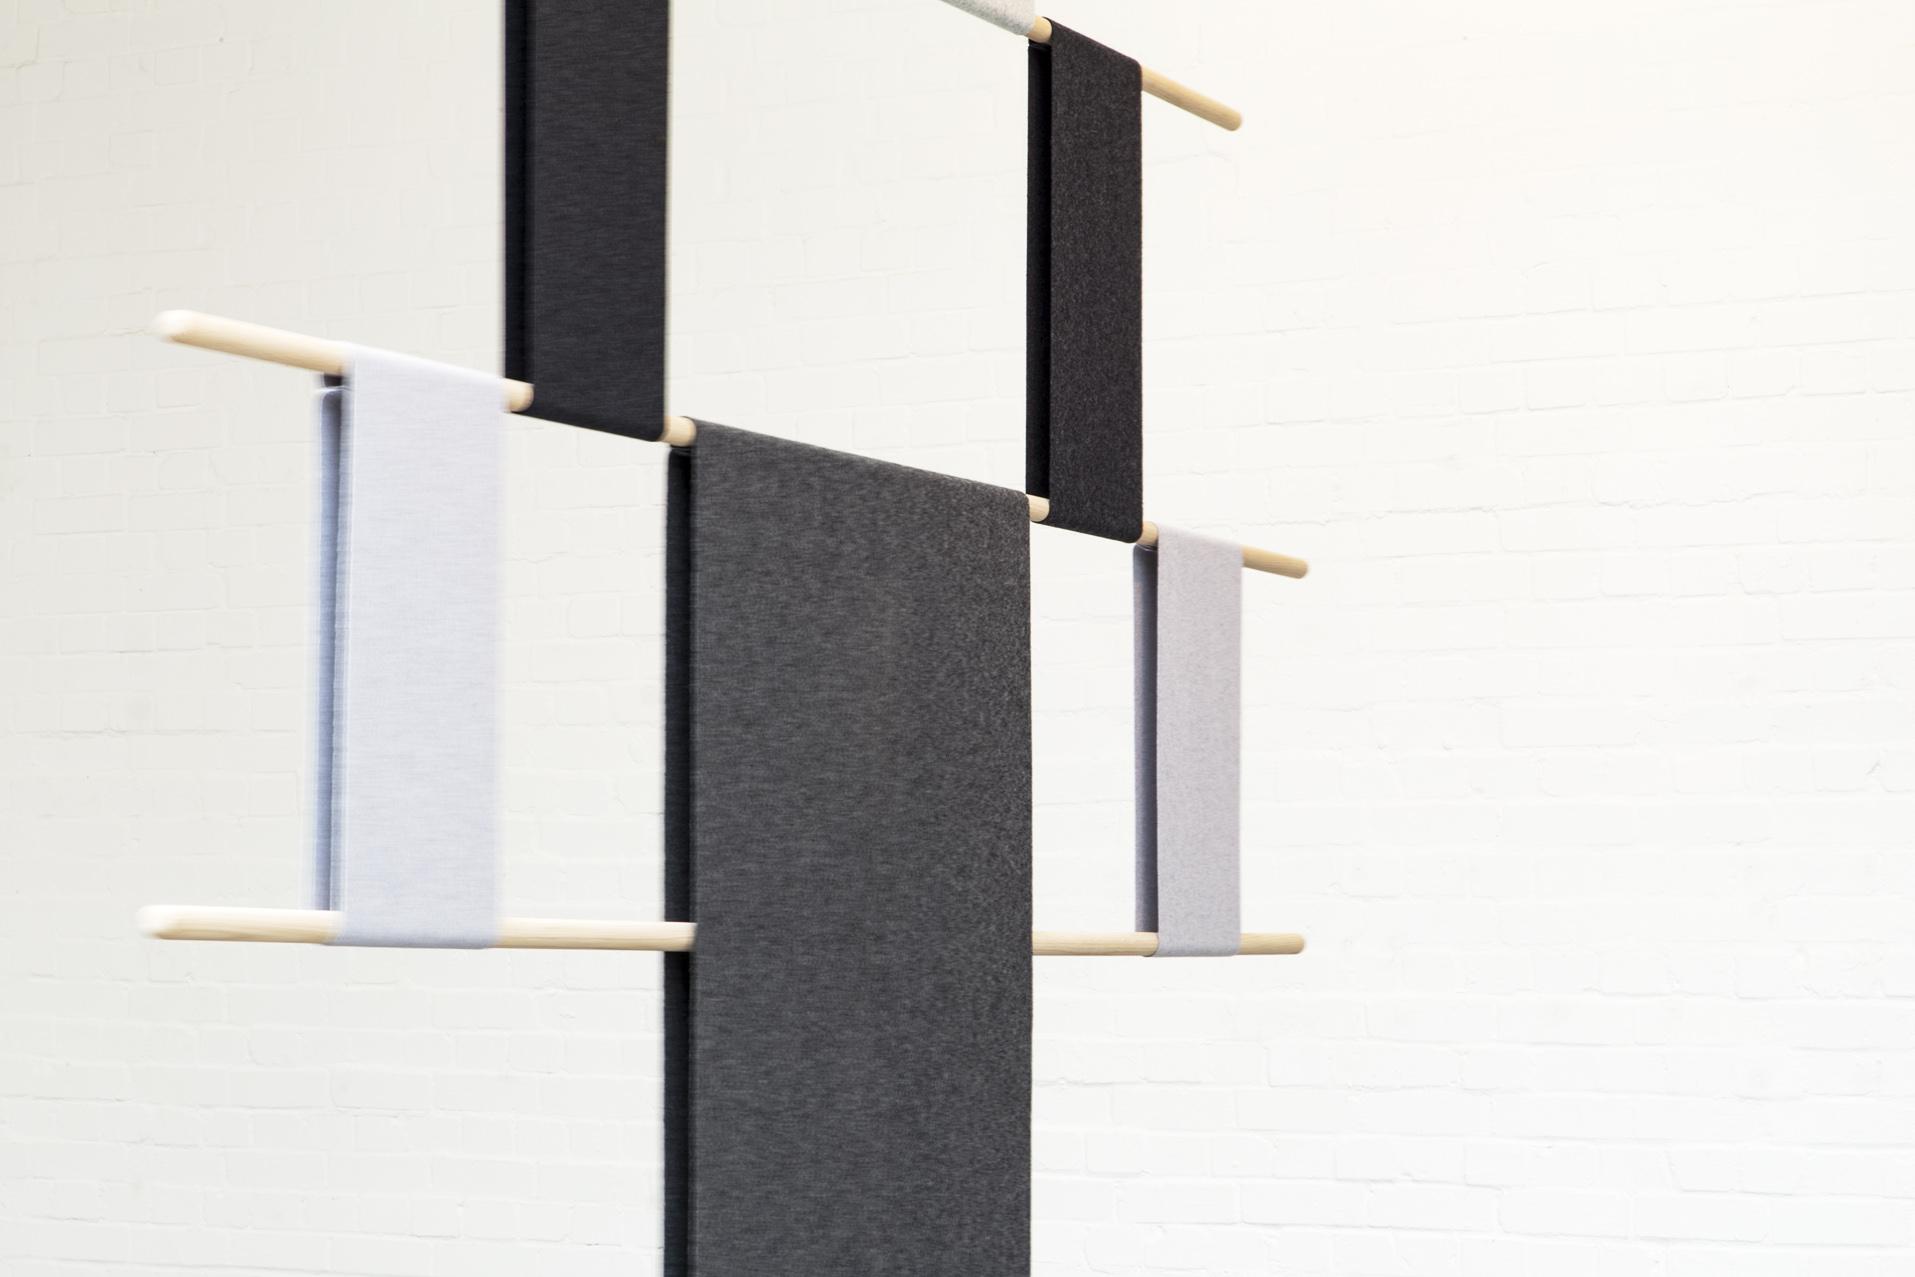 LDF Rive Roshan London Design Fair 2016